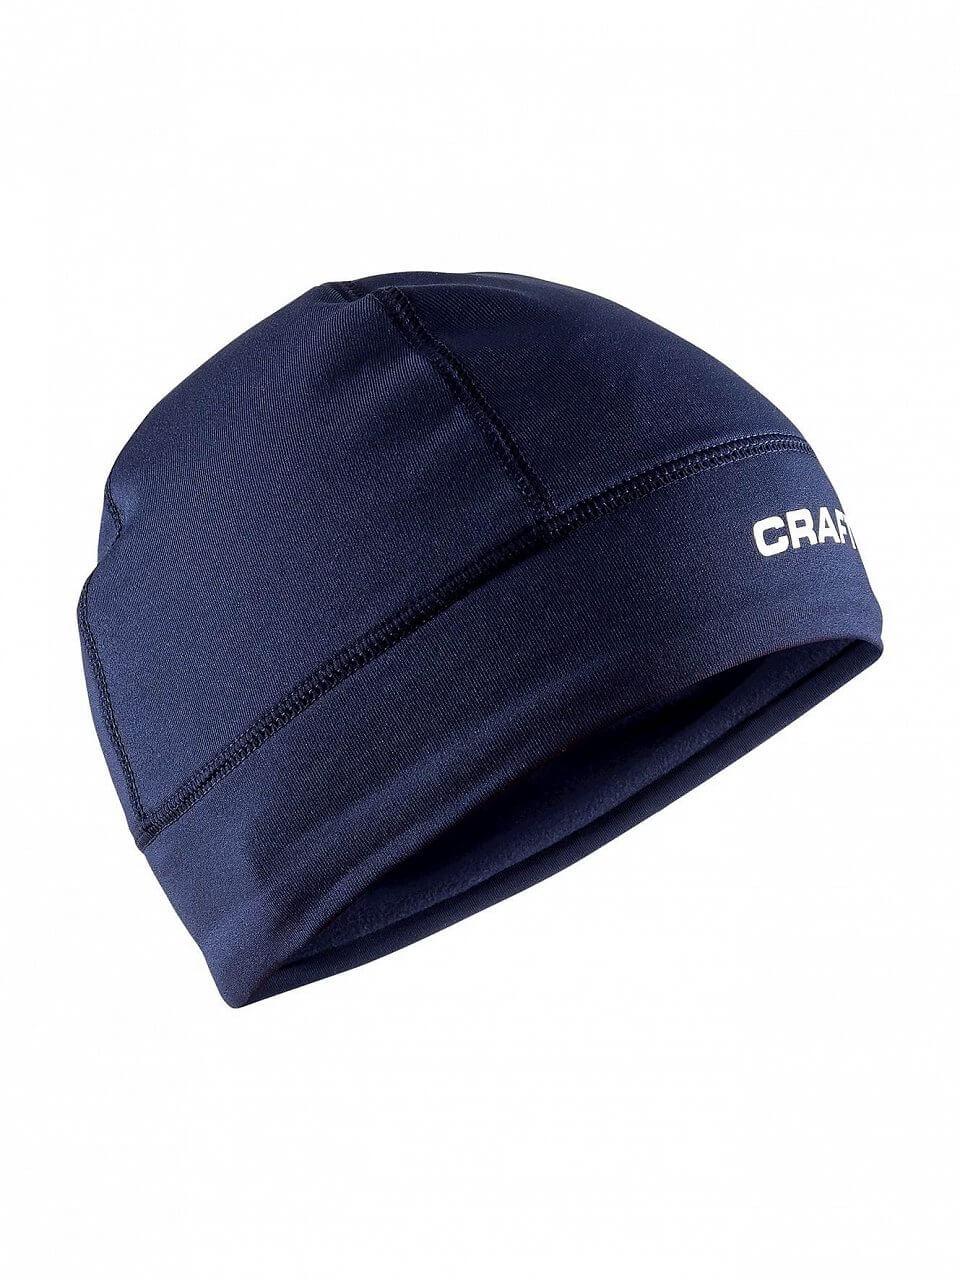 18cd5fcbd Craft Čiapky Light Thermal tmavo modrá | Sanasport.sk